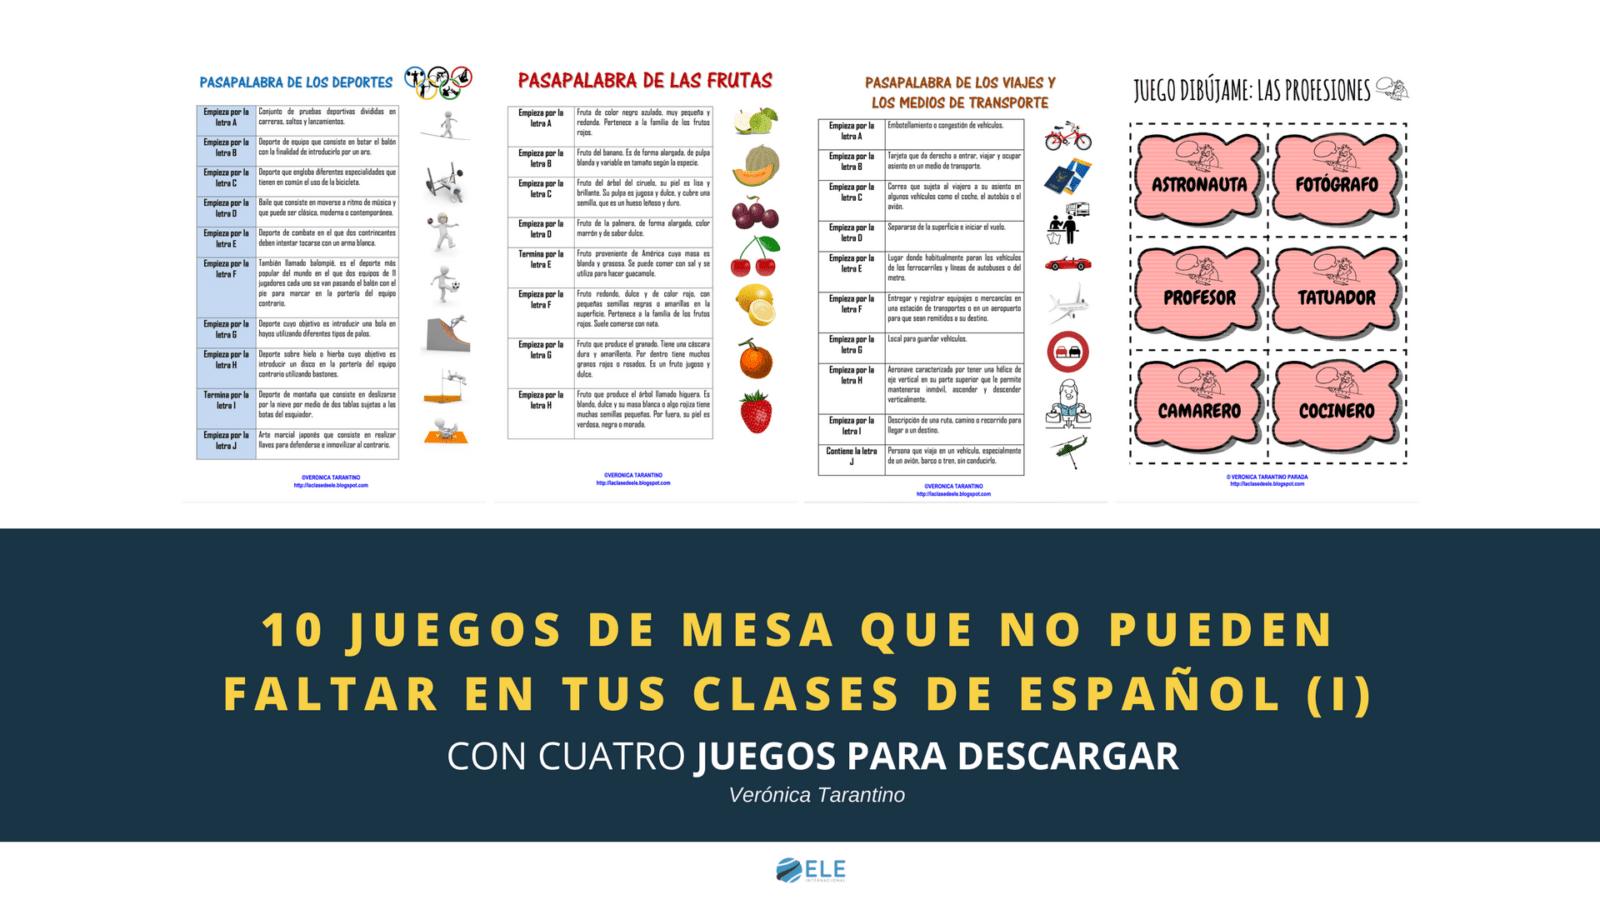 Juegos de mesa para clase. Juegos de mesa en clase de español. Spanish lessons Spanish. #profedeele #teachmoreSpanish